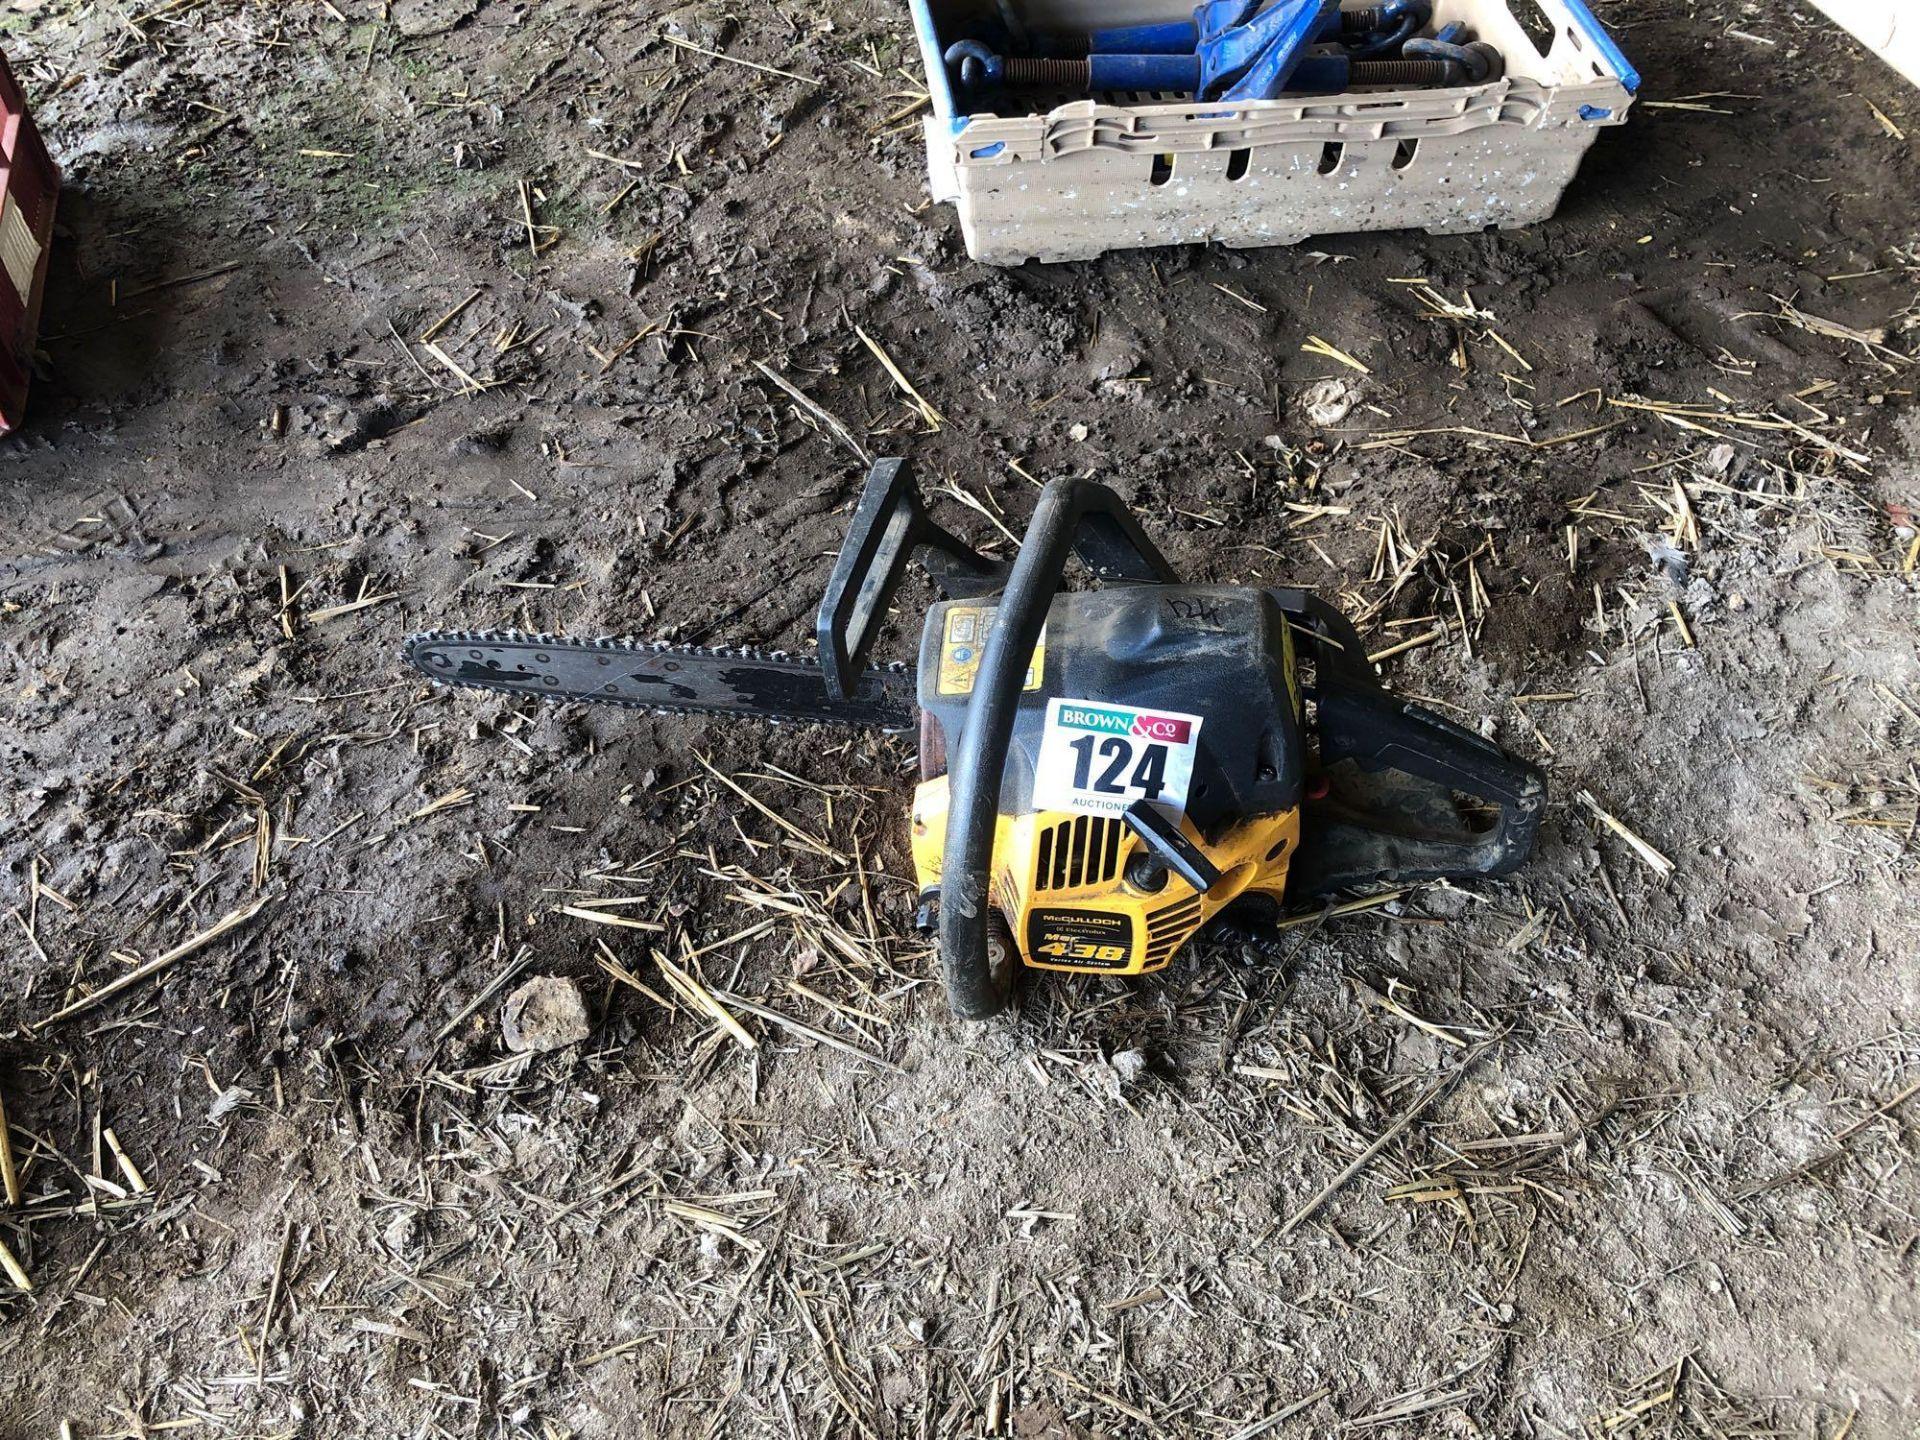 Lot 124 - McCulloch 438 Mac chainsaw